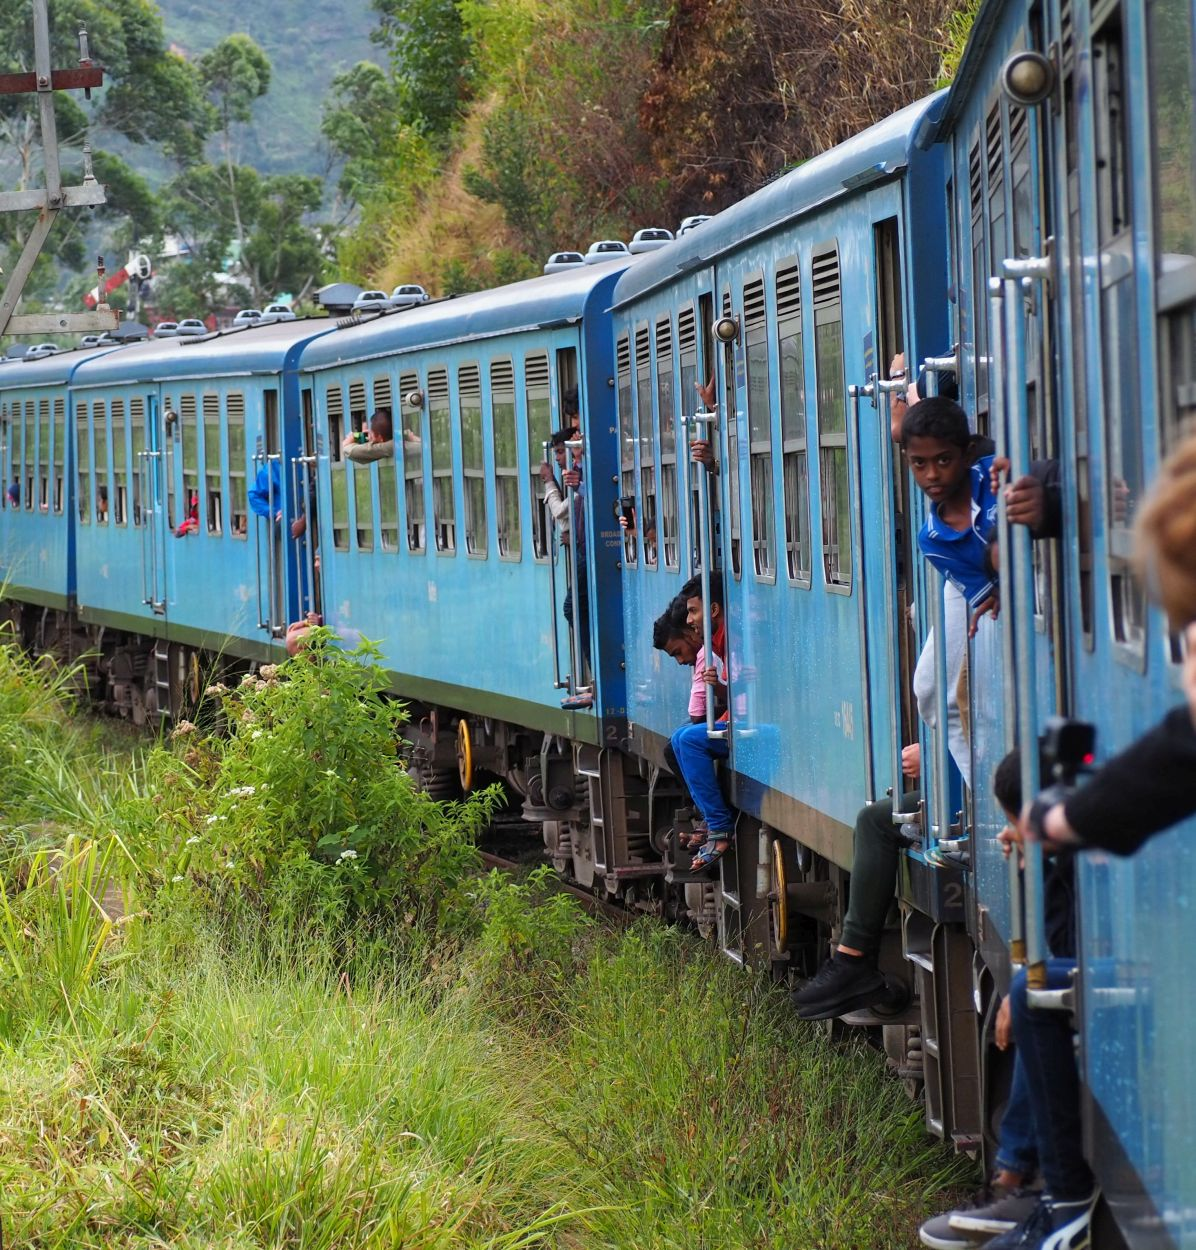 Reiseberichte aus aller Welt cover image